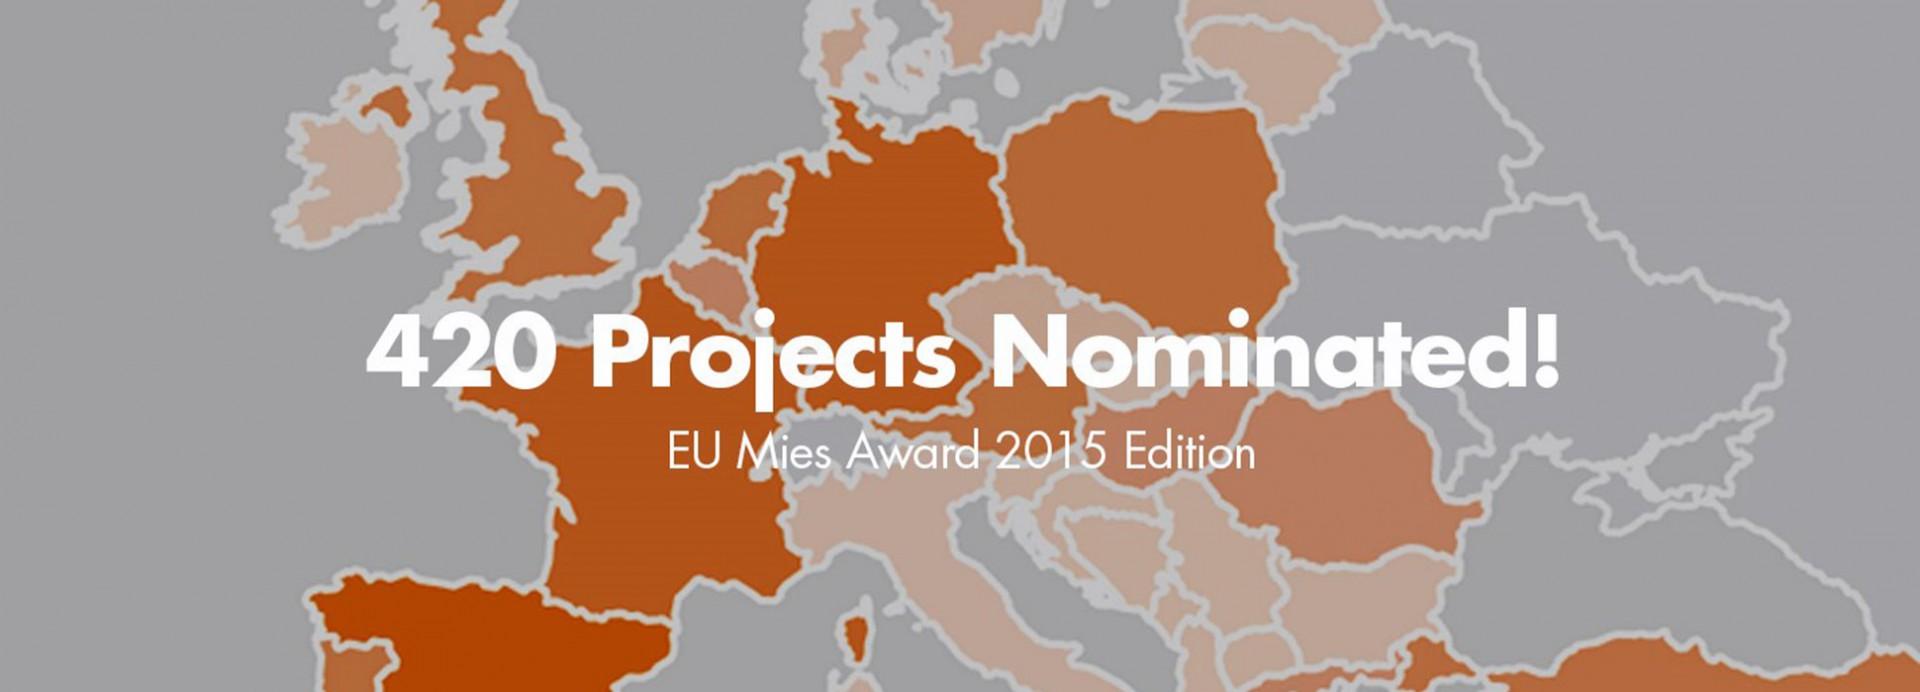 Mies van der Rohe nagrada 2015: objavljene nominacije